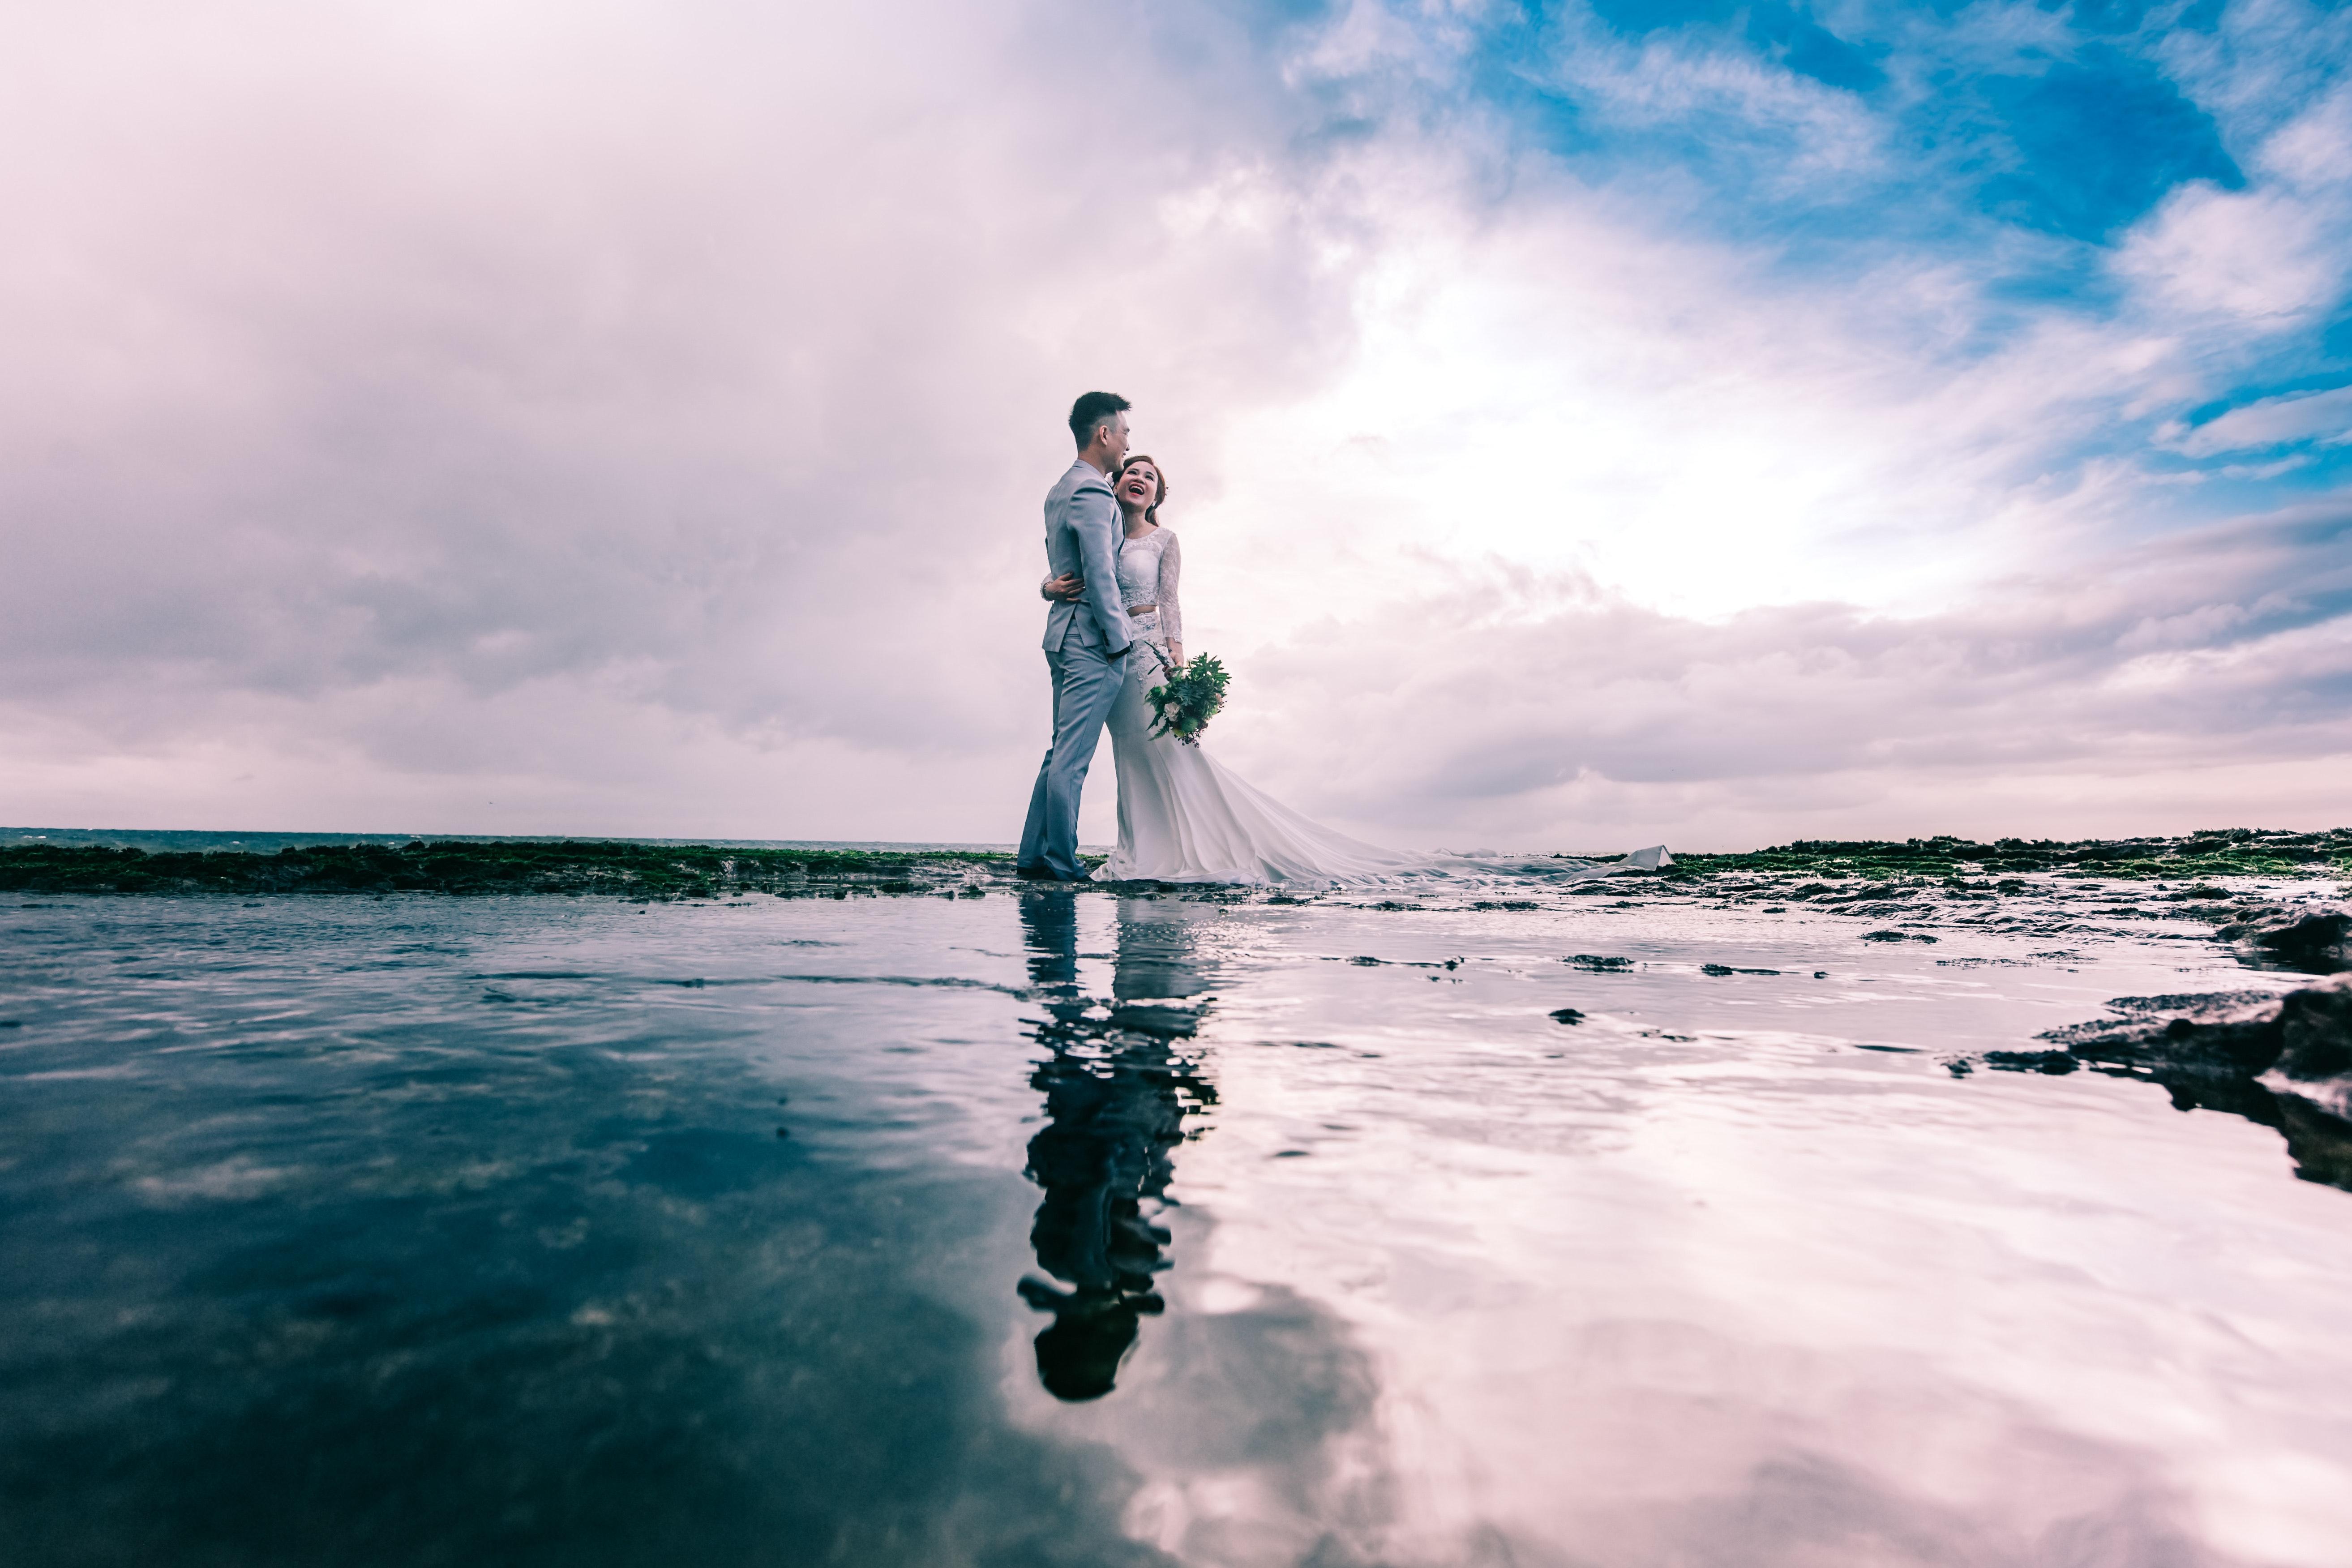 rain on wedding day wedding planner